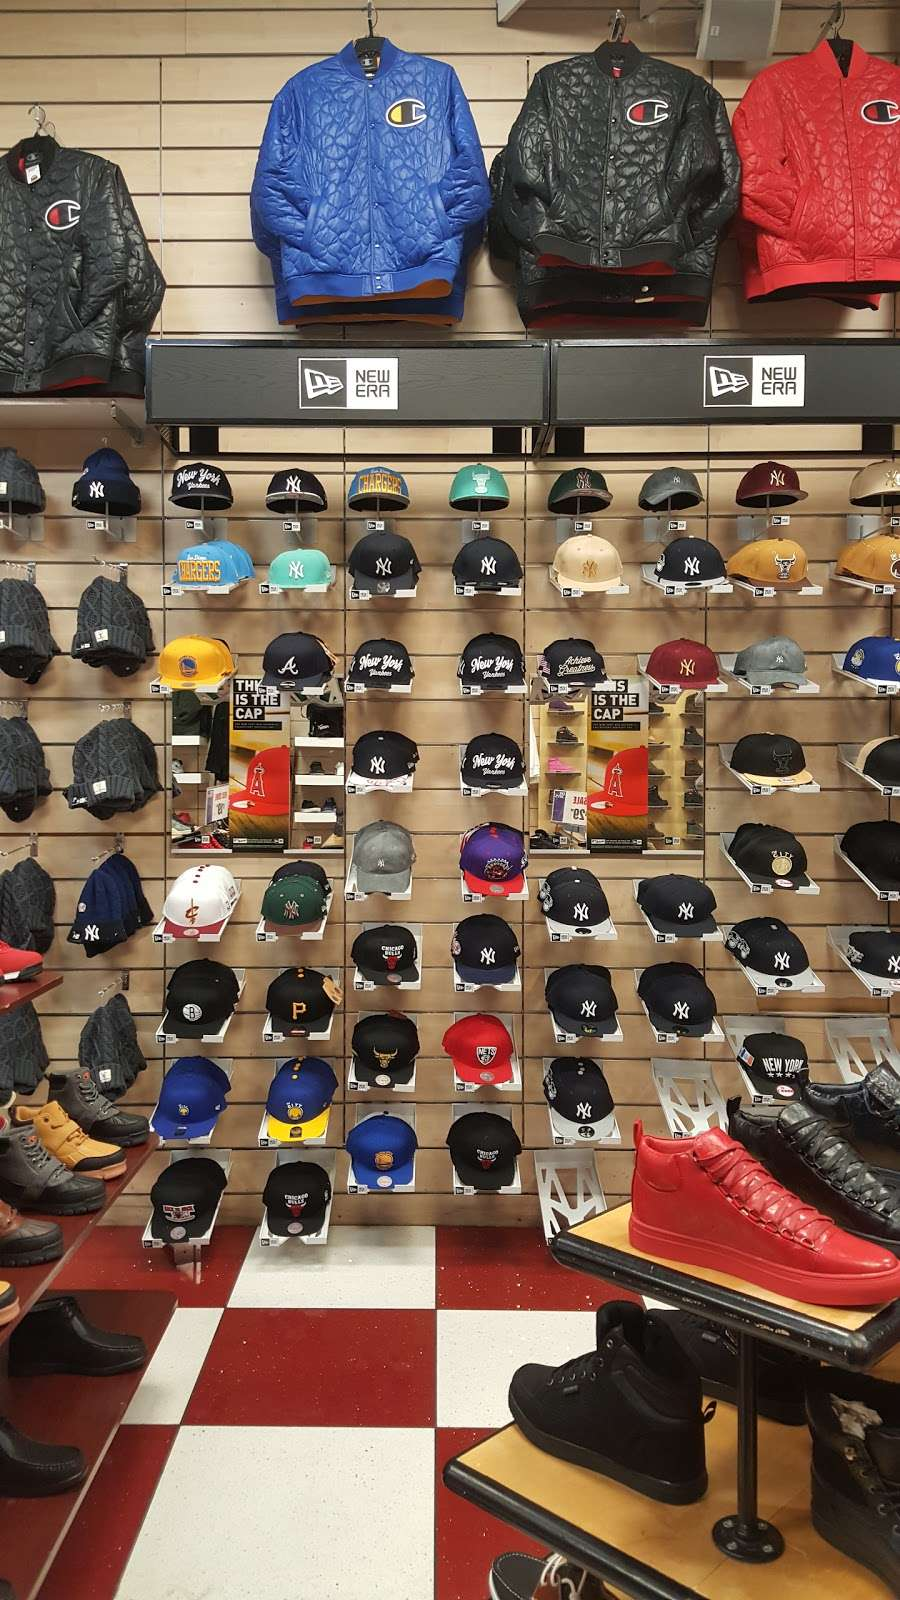 Dr Jays - clothing store  | Photo 7 of 10 | Address: 215 E Fordham Rd, The Bronx, NY 10458, USA | Phone: (718) 220-3354